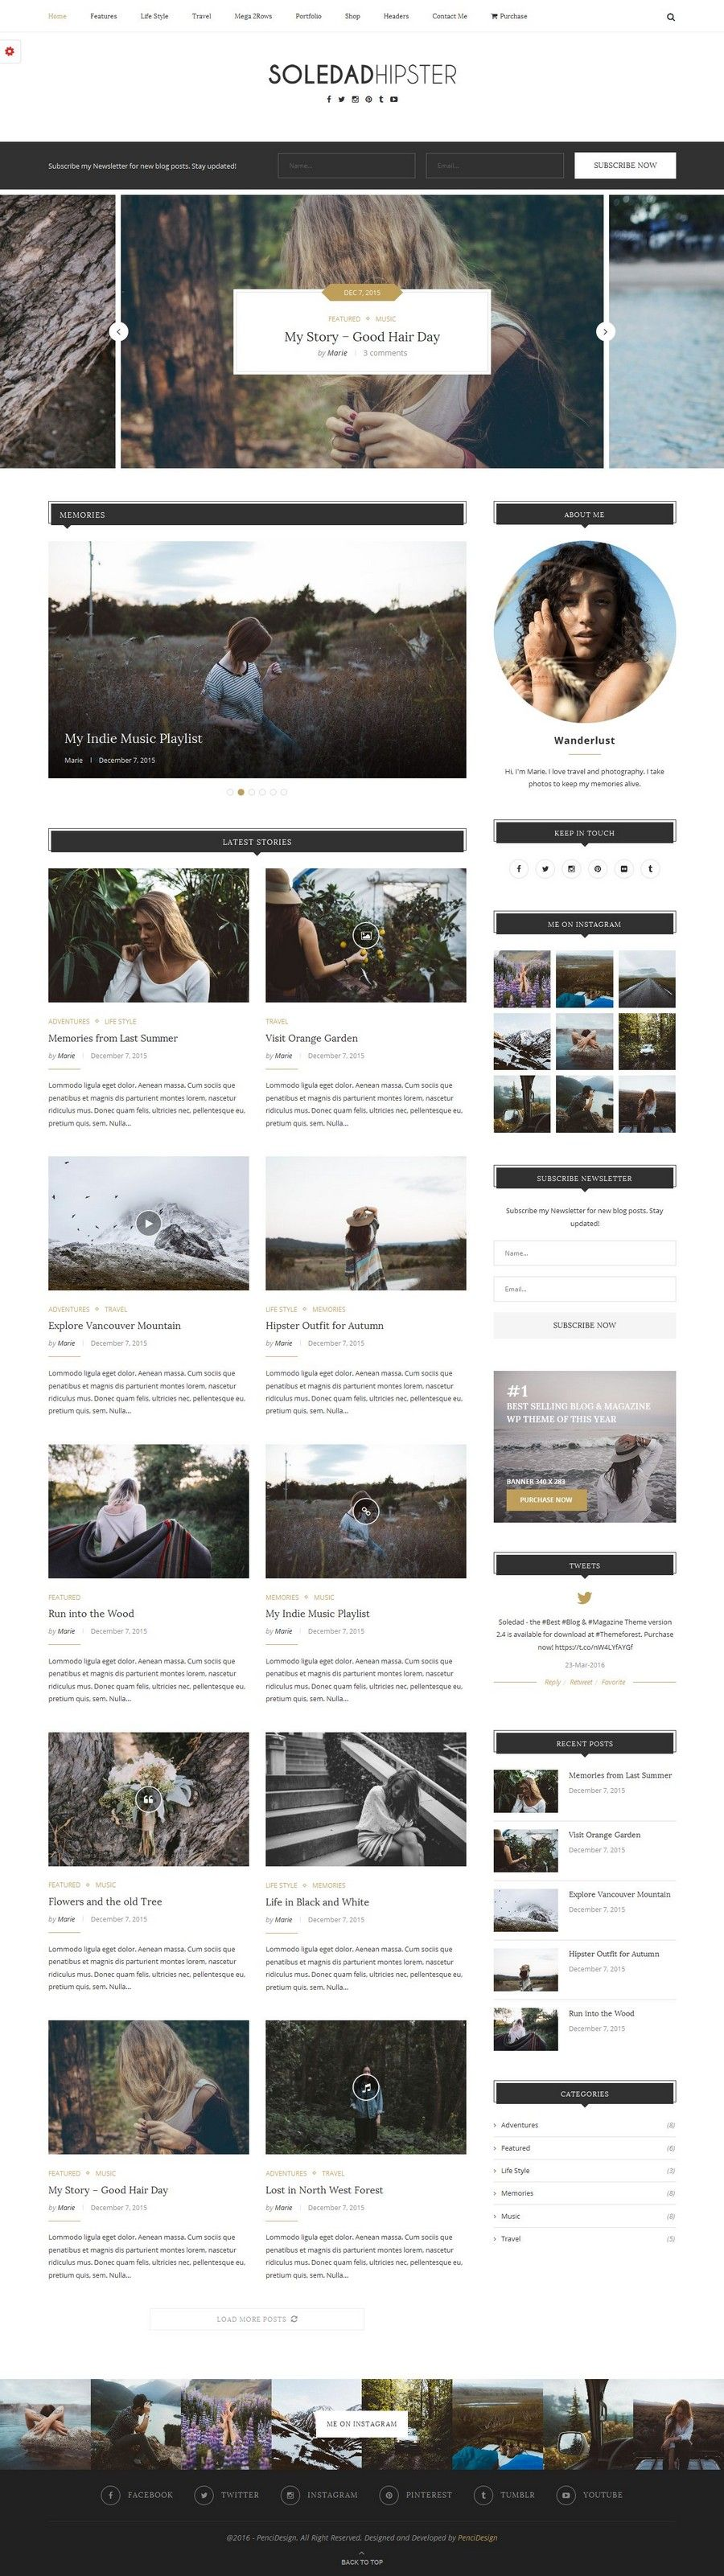 Hipster Magazine Theme for Wordpress